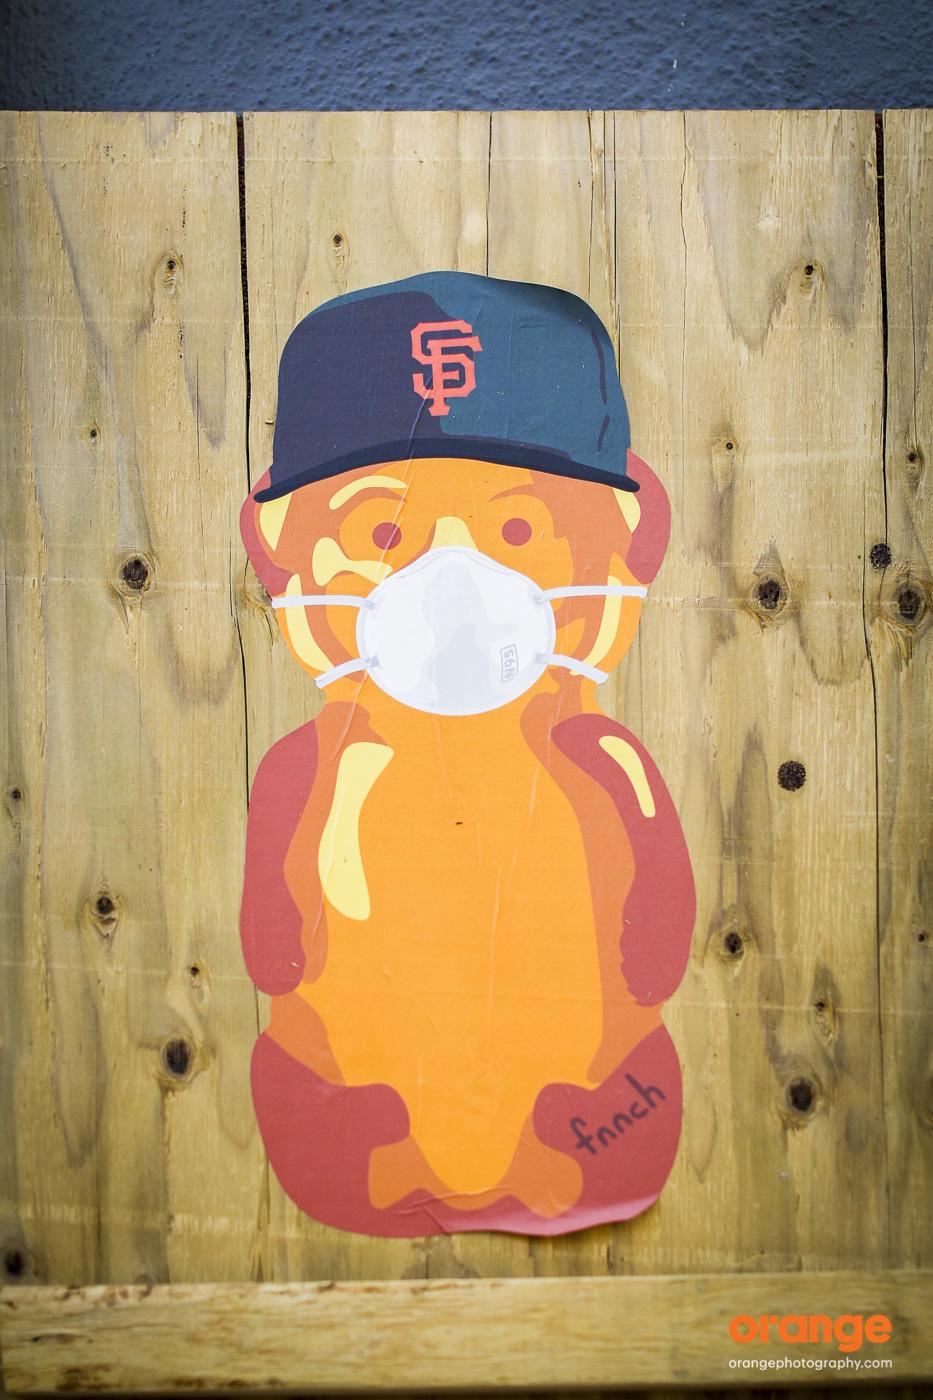 Photo Journal – Life in Quarantine: San Francisco